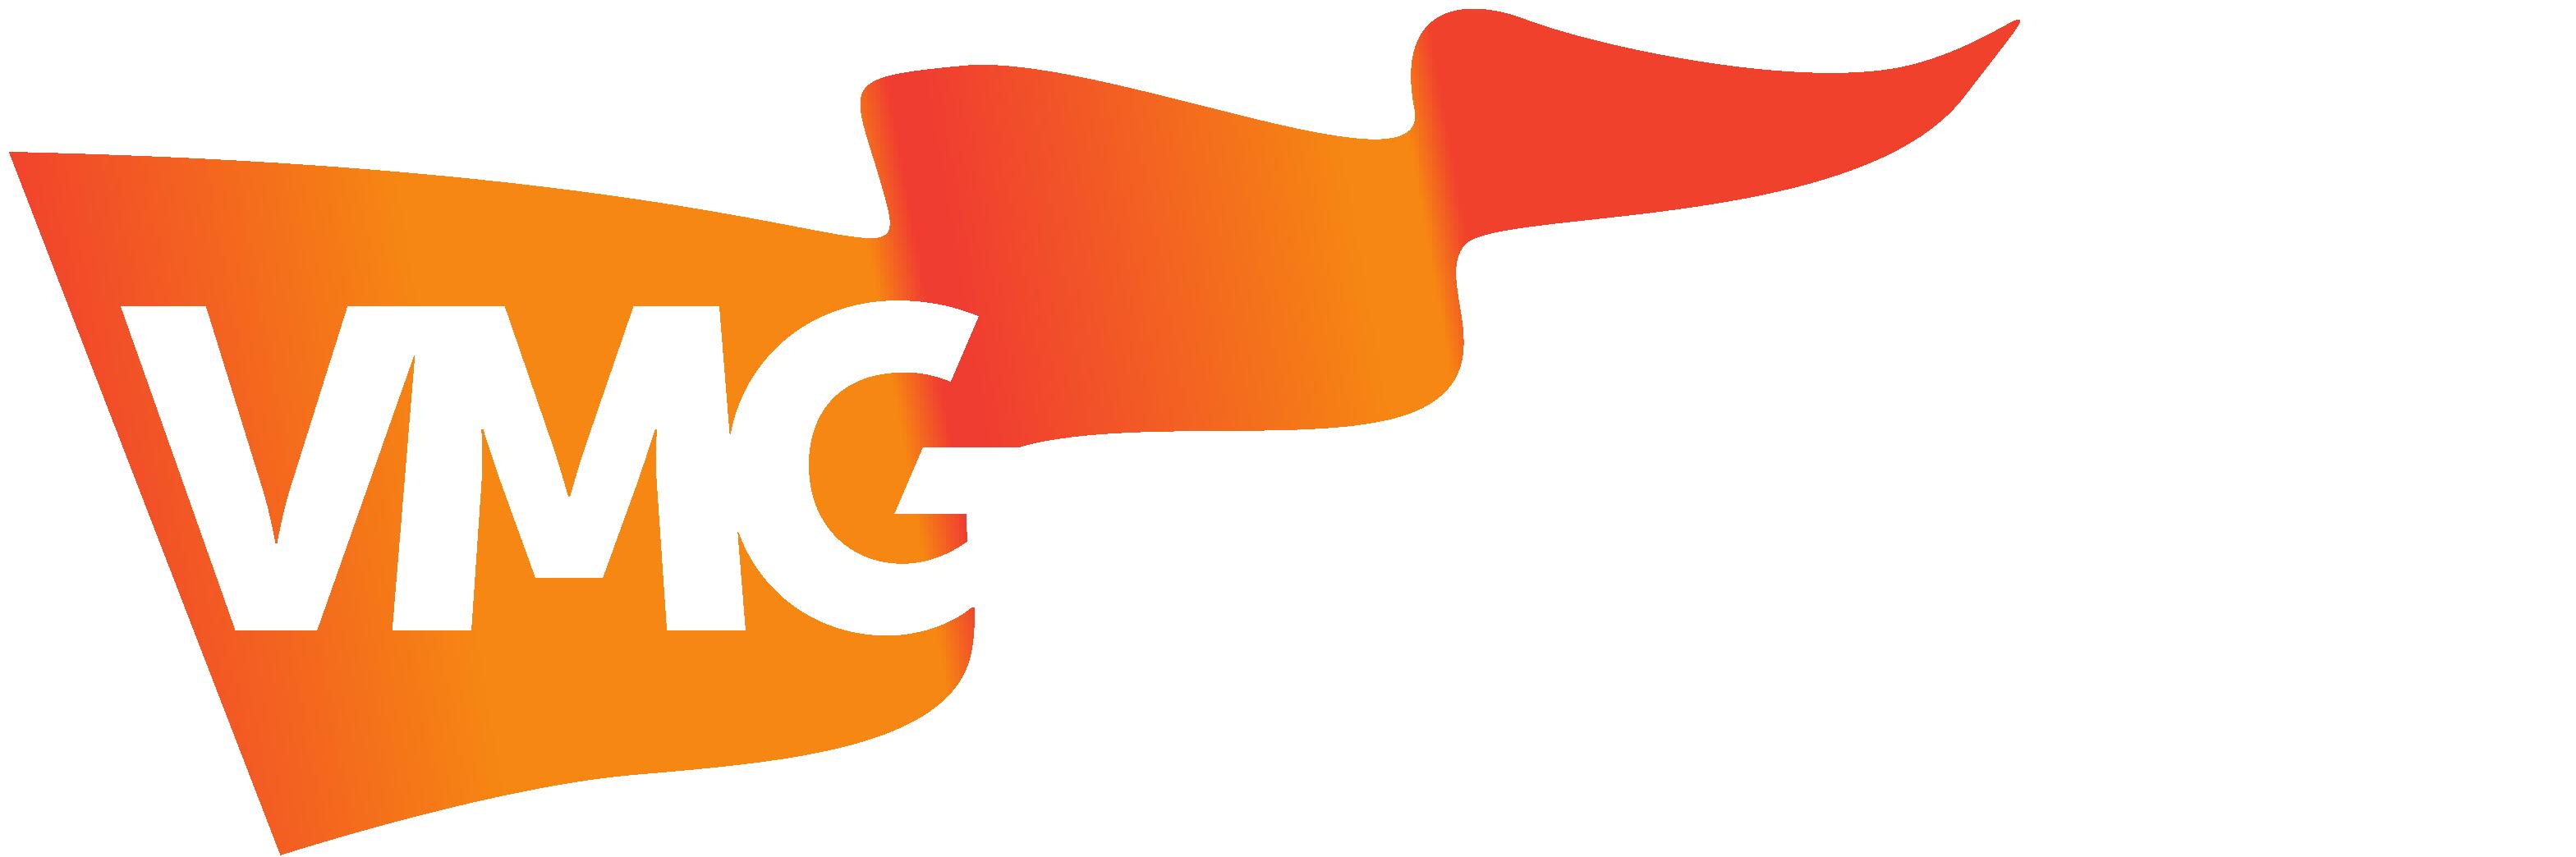 VMG Yachtbuilders logo